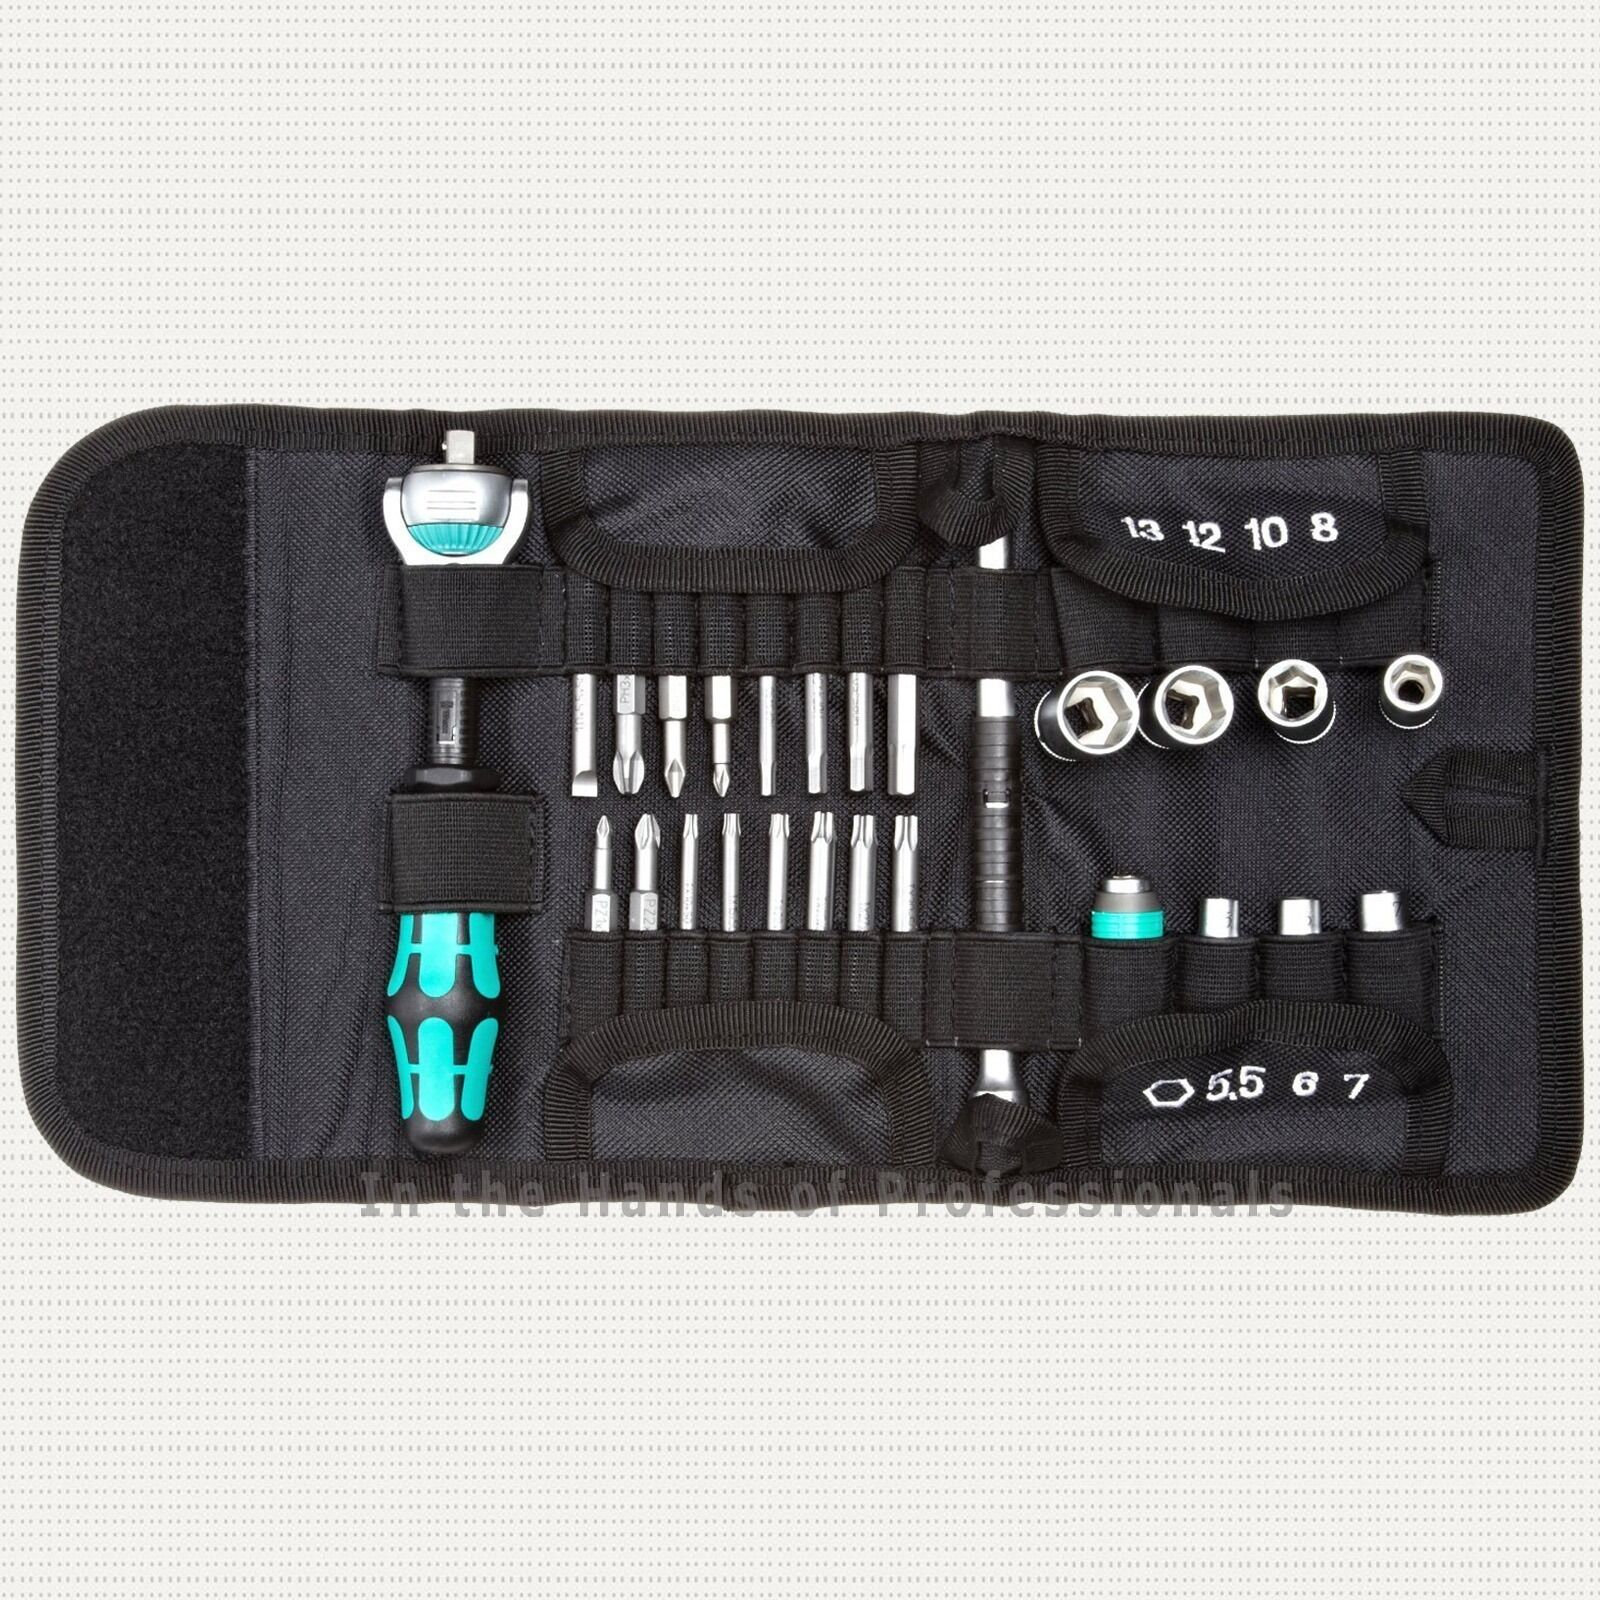 wera tools zyklop ratchet sae socket bit 26pc set w pouch 05160787001 ebay. Black Bedroom Furniture Sets. Home Design Ideas